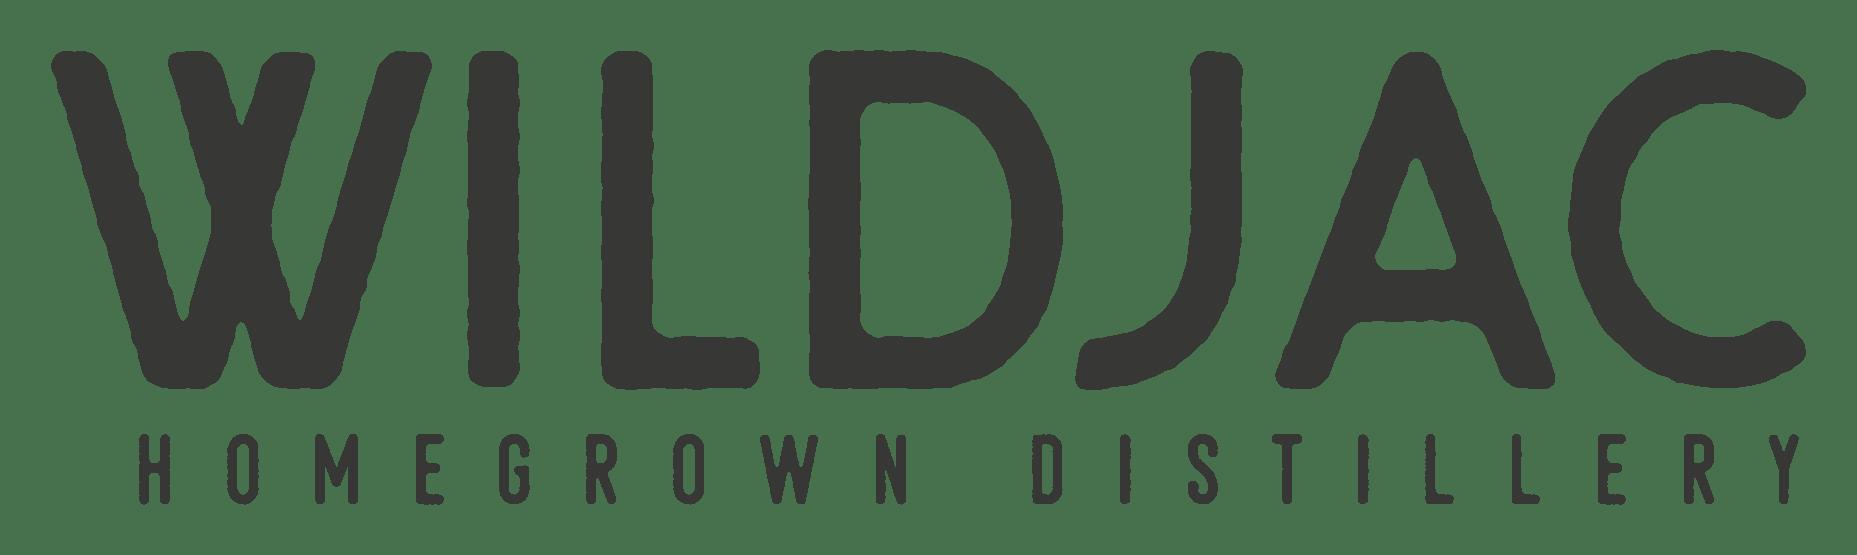 Wildjac logo